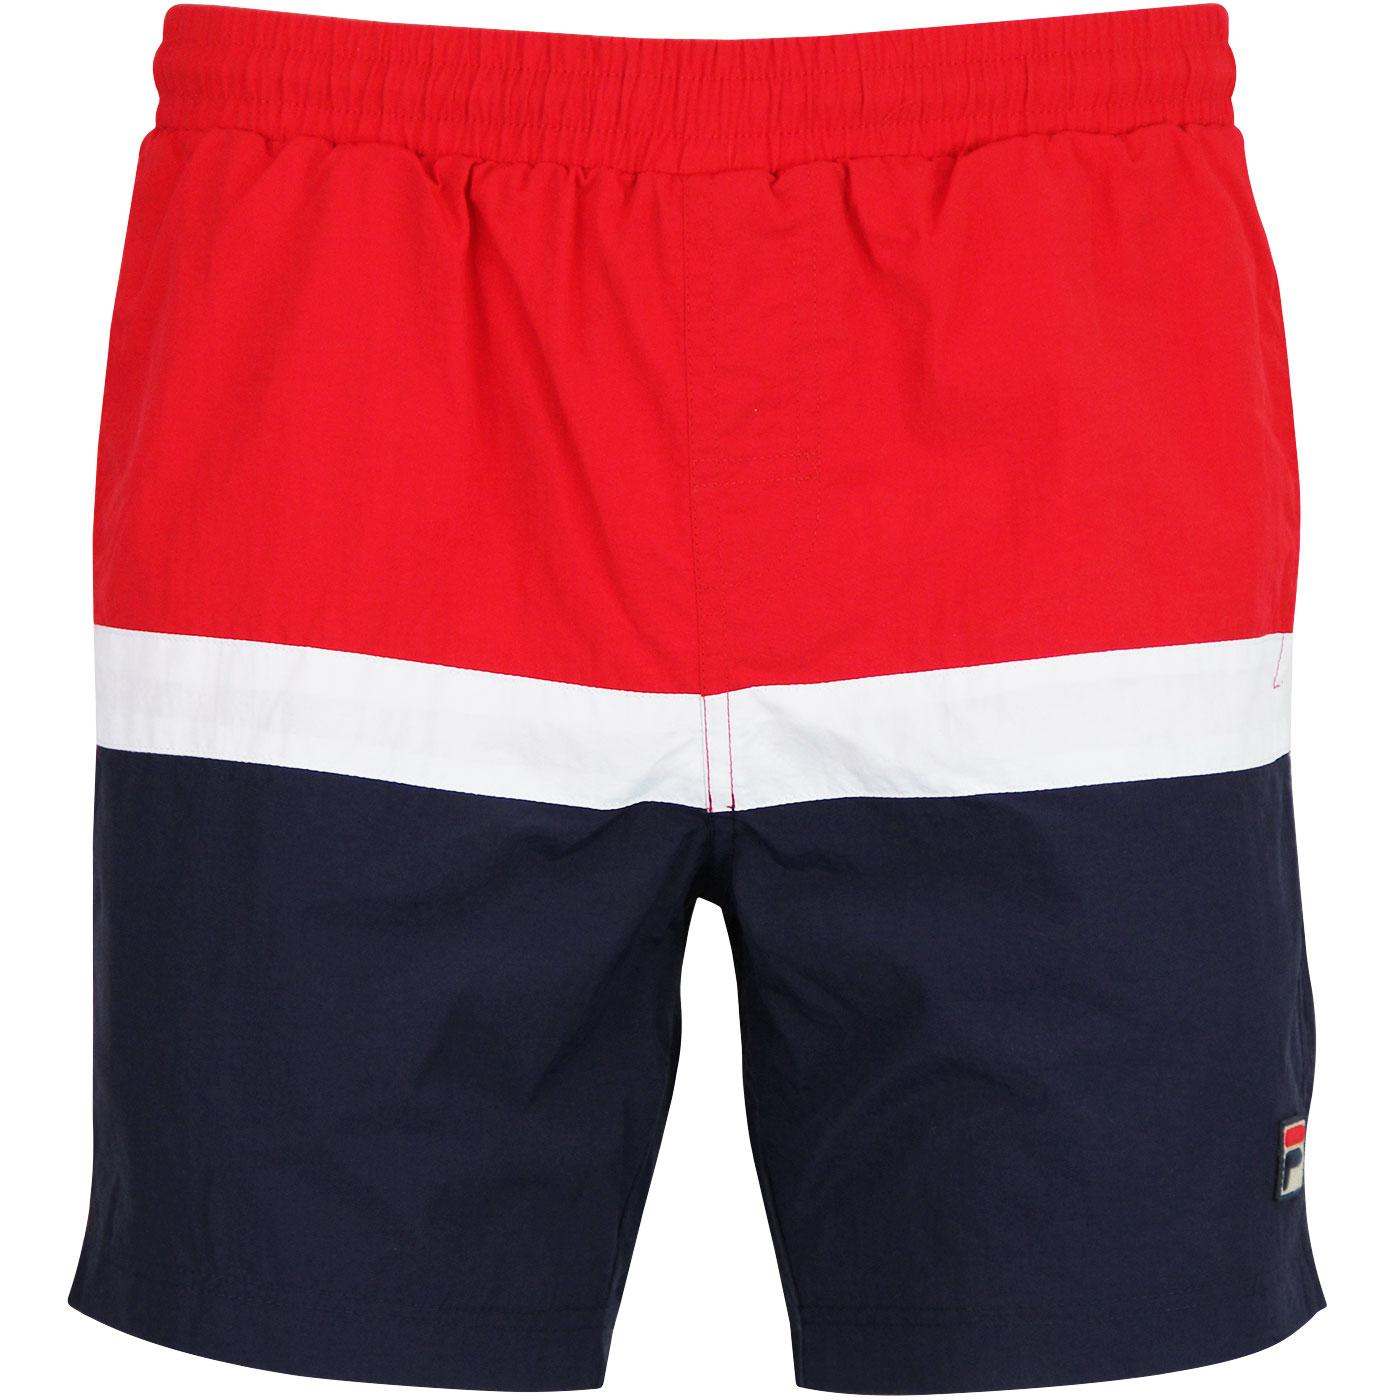 Peter FILA VINTAGE Colour Block Swim Shorts RED